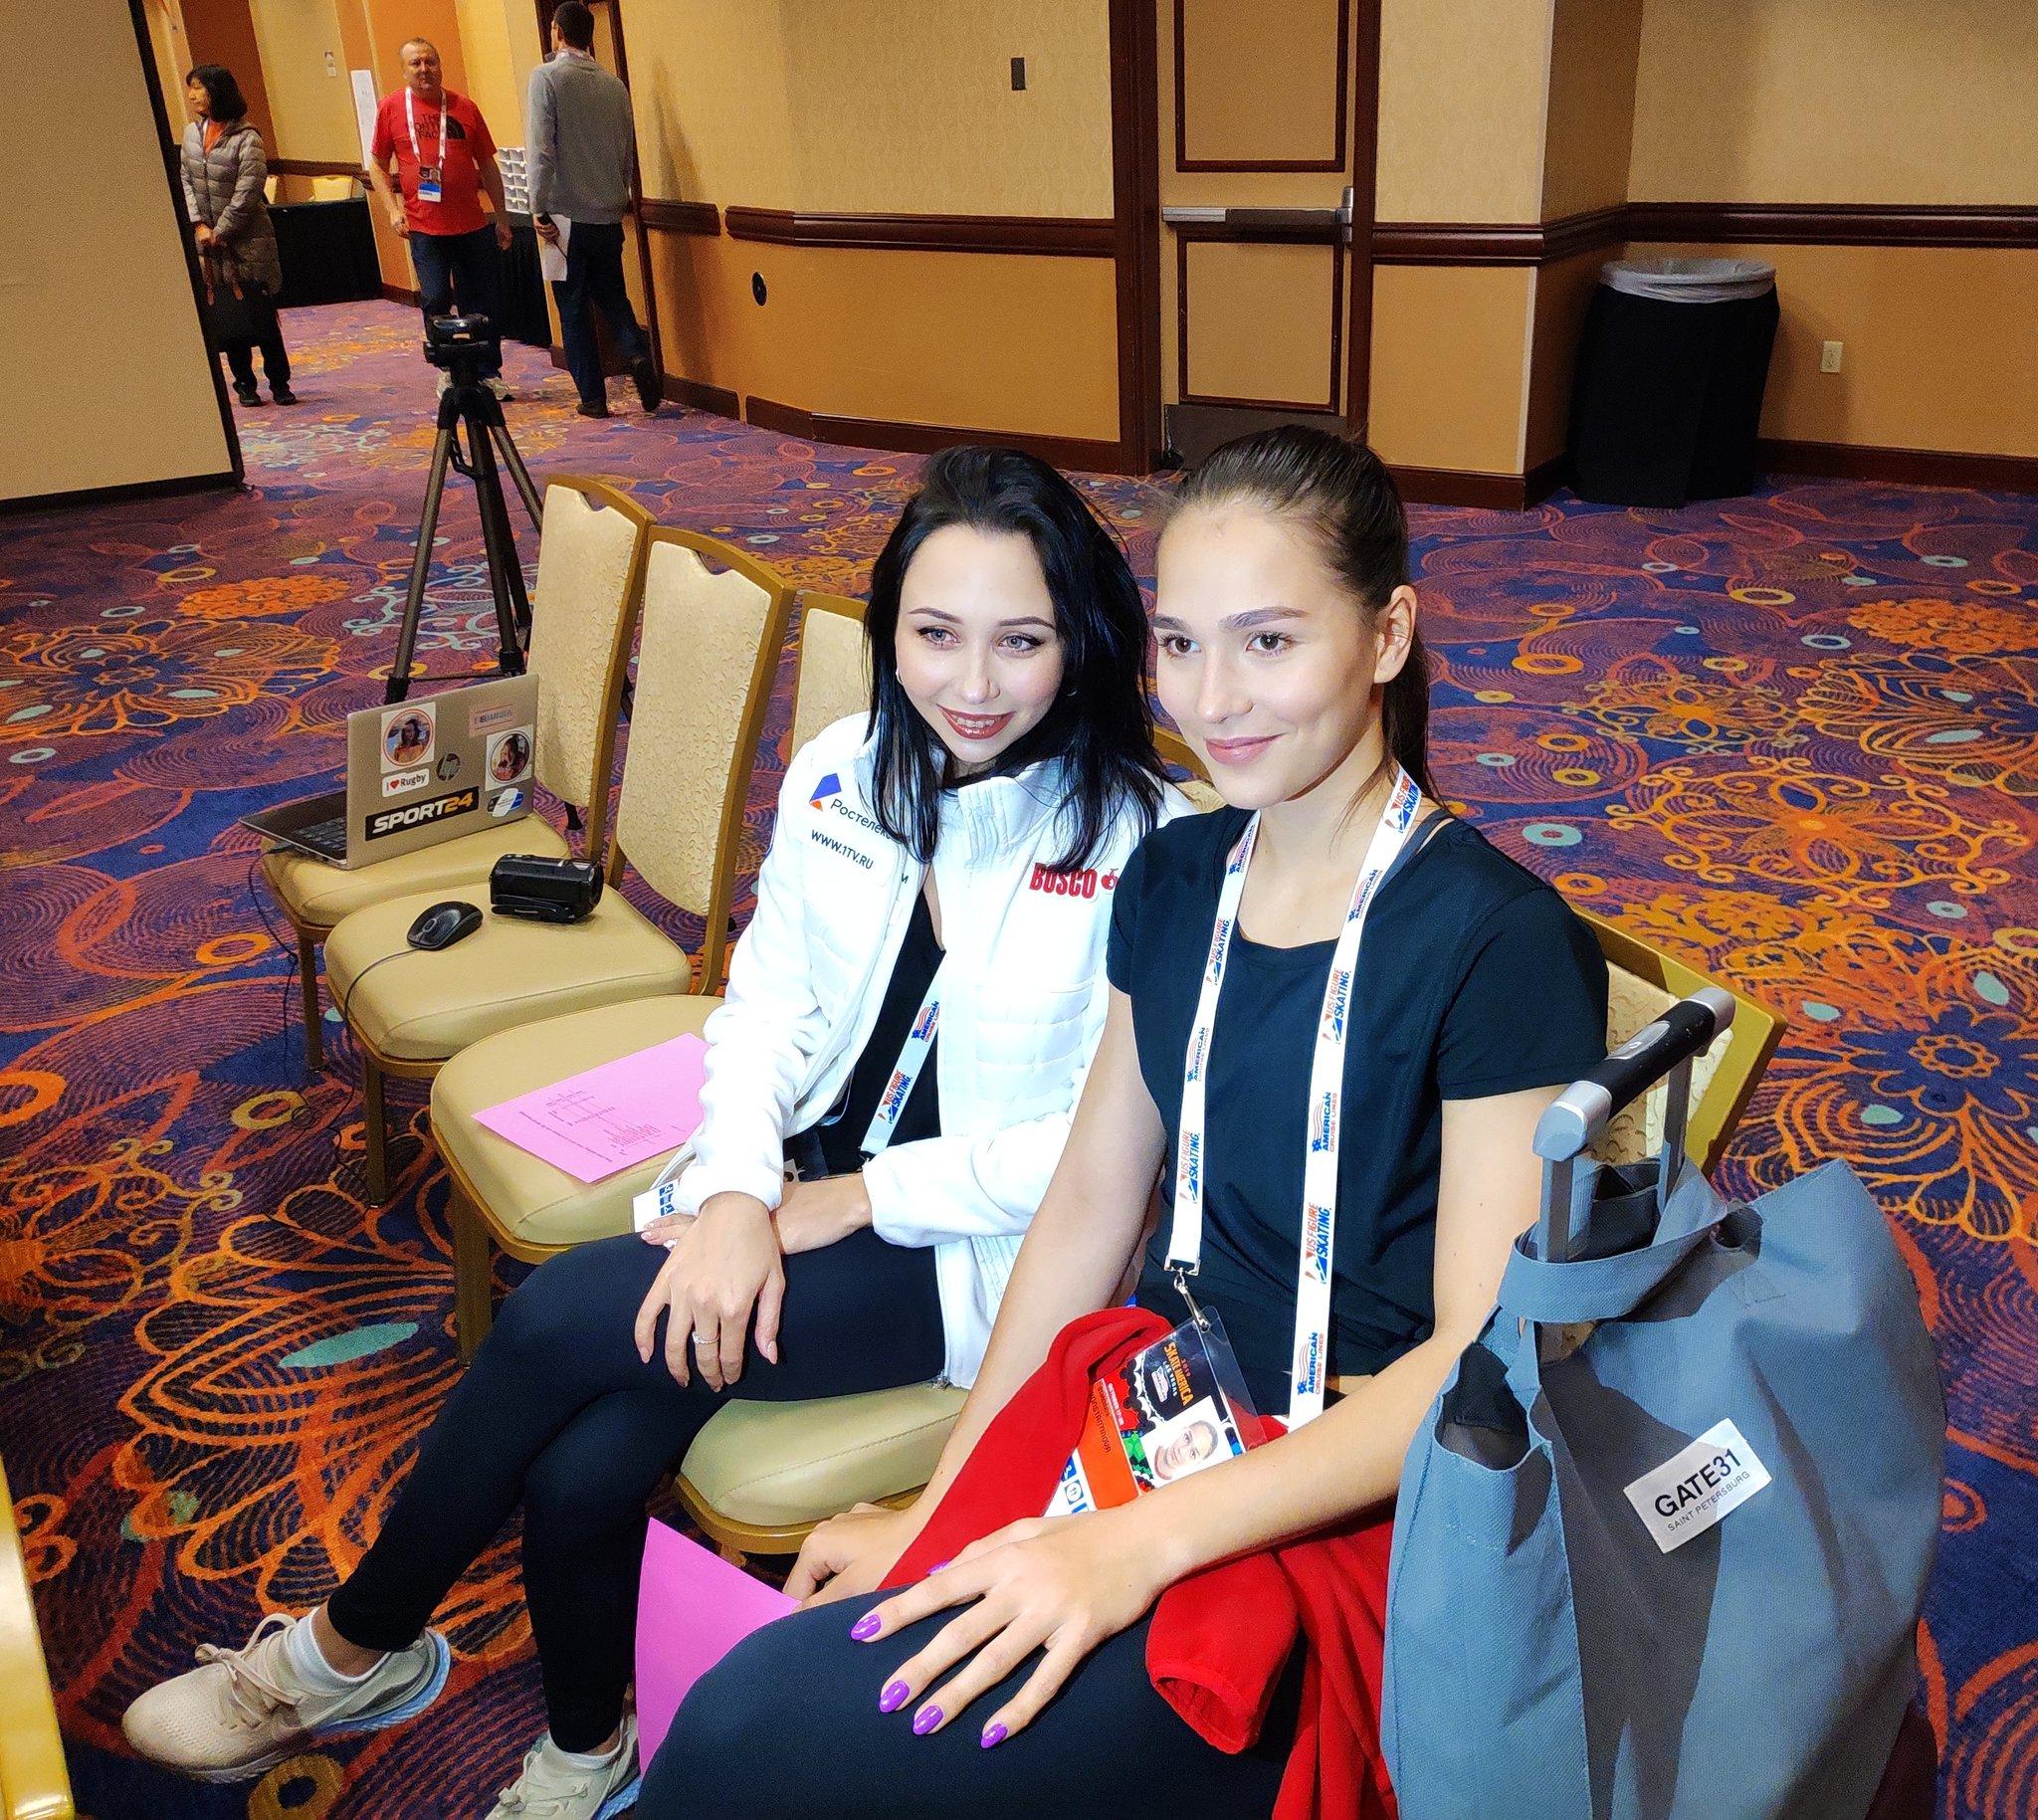 GP - 1 этап. Skate America Las Vegas, NV / USA October 18-20, 2019   - Страница 3 EHHeiyYW4BM93u-?format=jpg&name=4096x4096